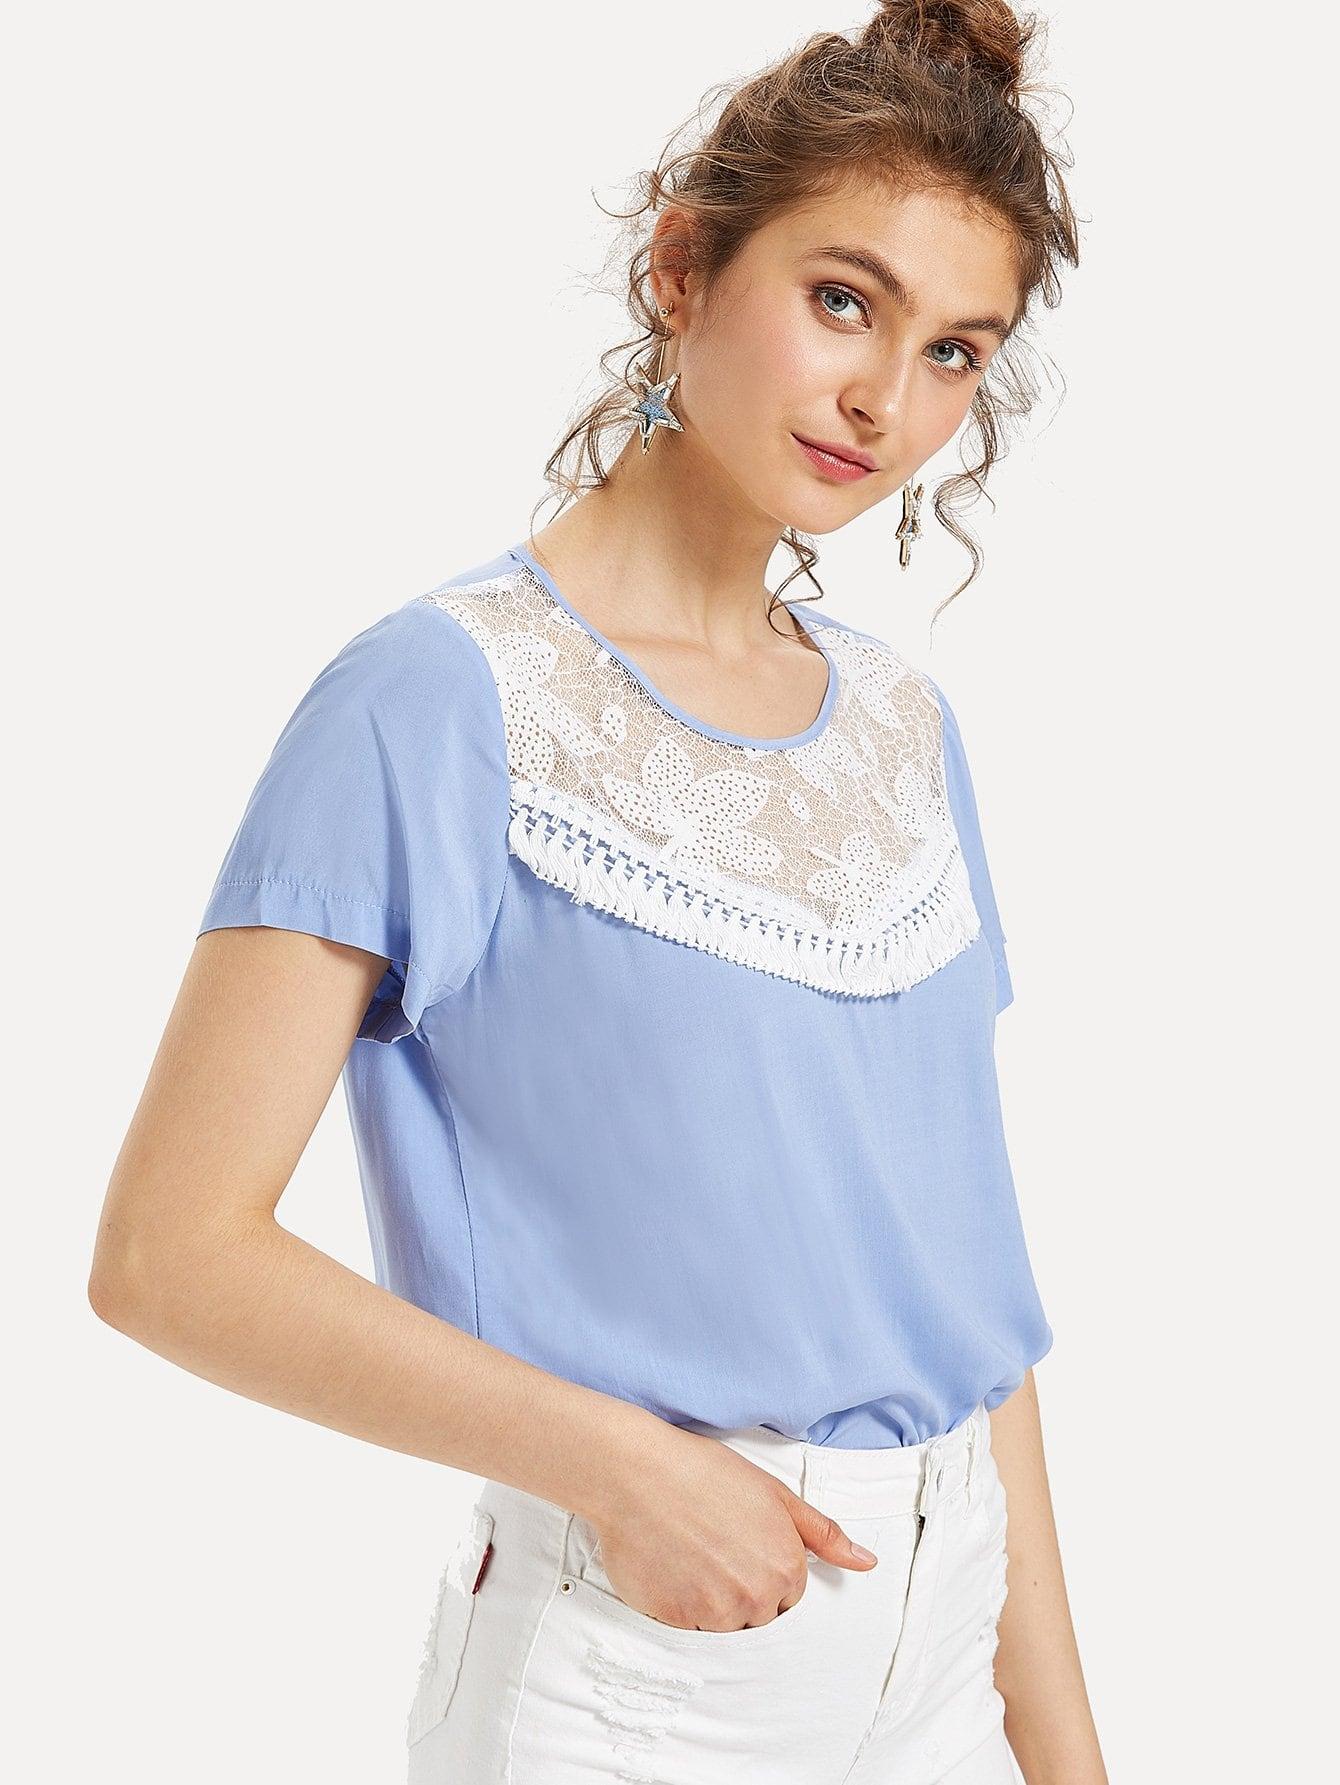 Lace Insert Tassel Embellished Top блузки a karina блузка